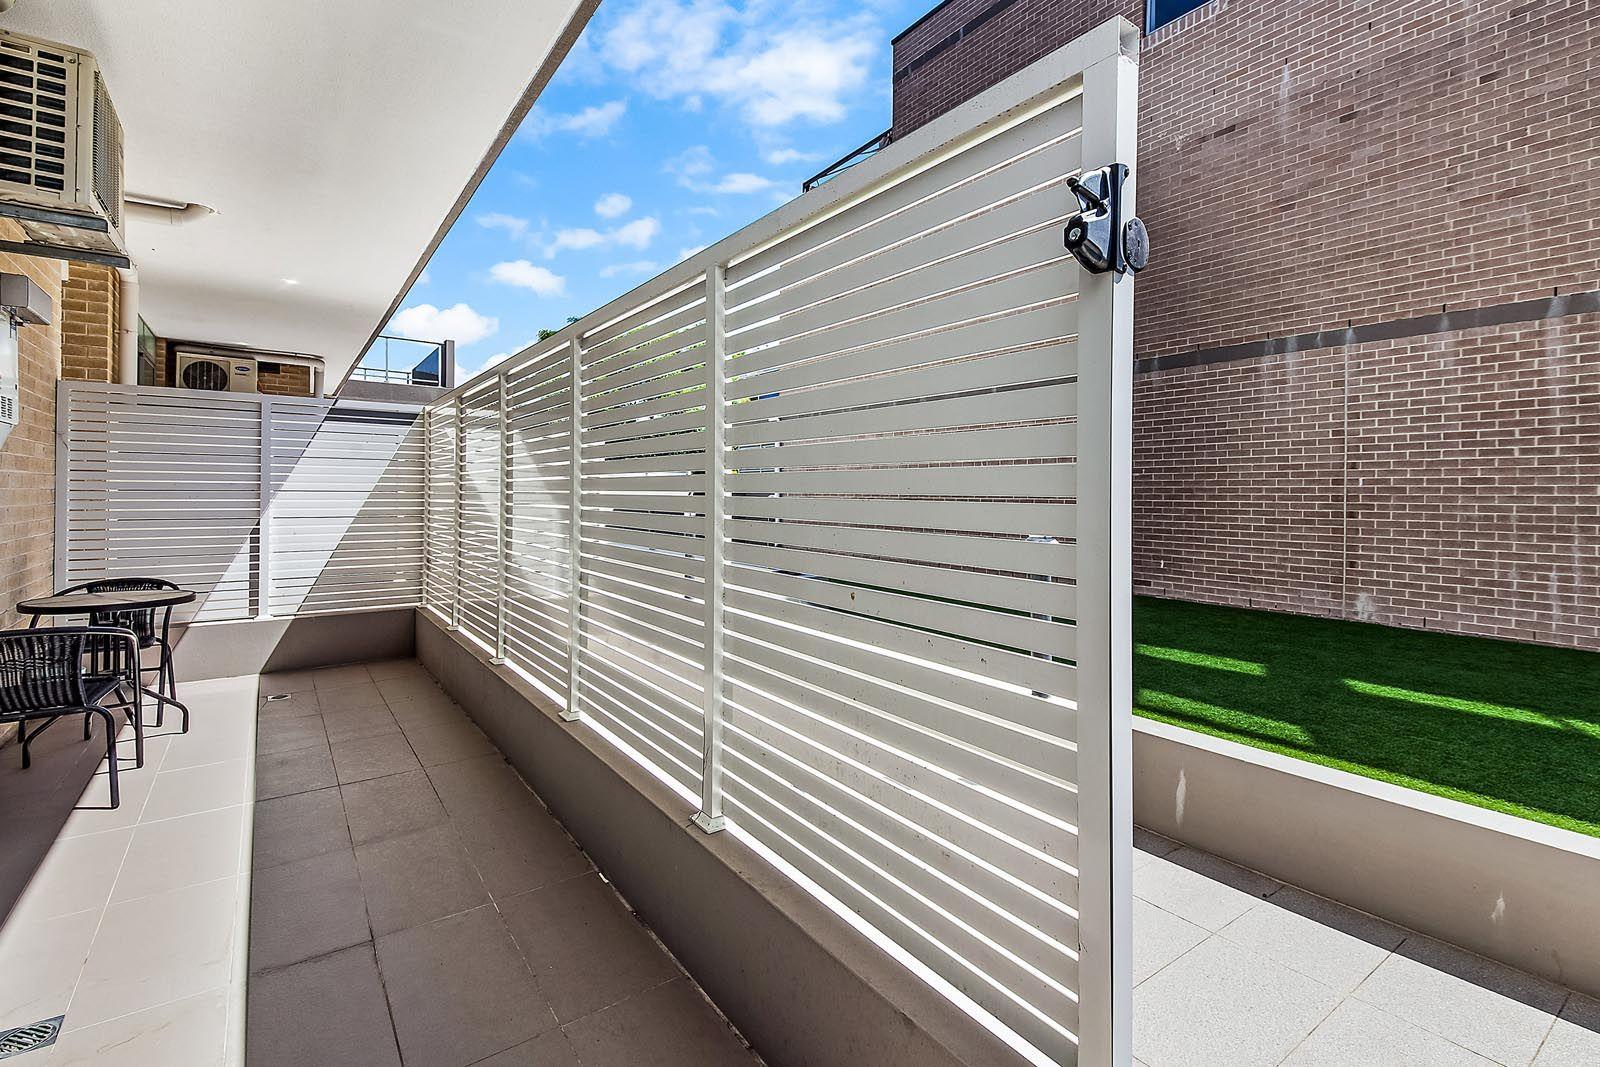 67/79-87 Beaconsfield Street, Silverwater NSW 2128, Image 1